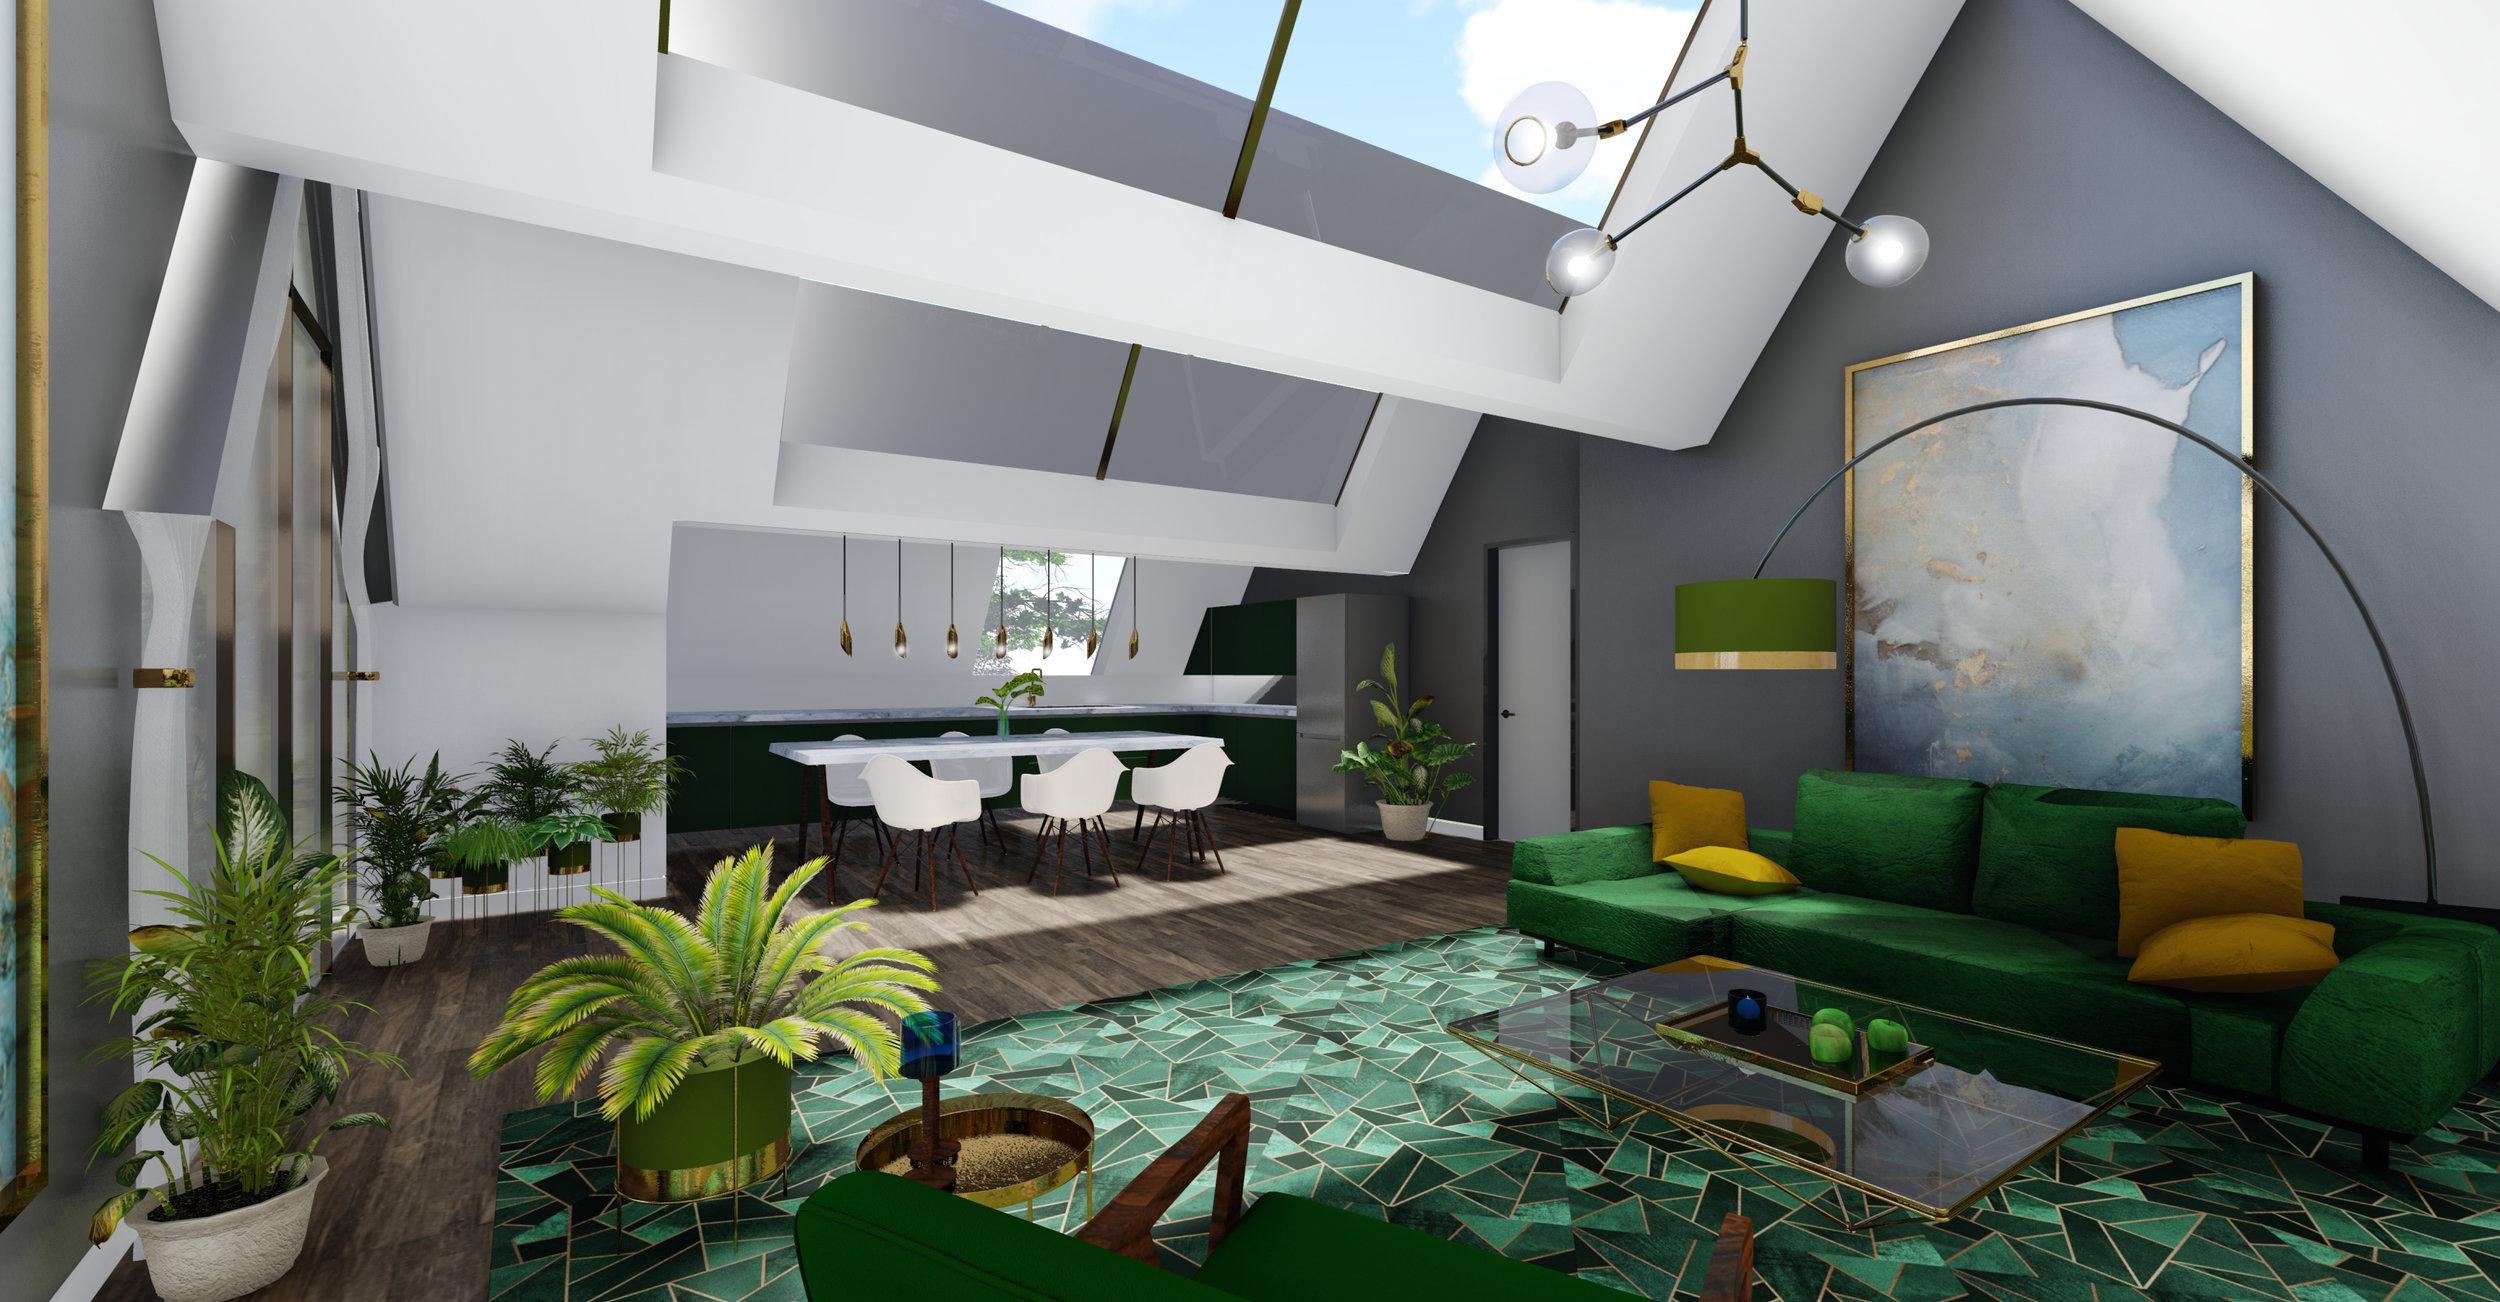 © Copyright Studio DS 2018 - the Multi Home Smart Home Interior Design 1